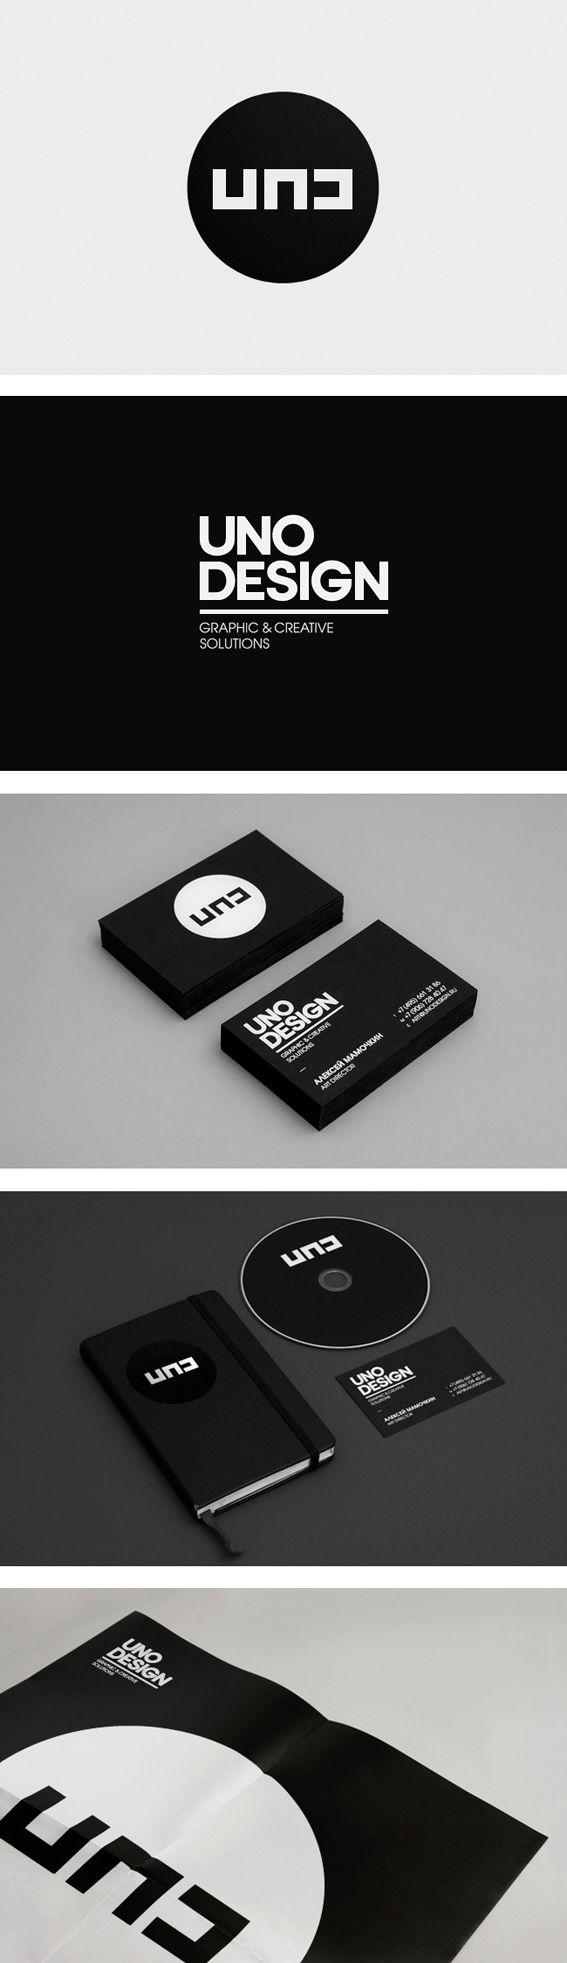 #identity #design #branding